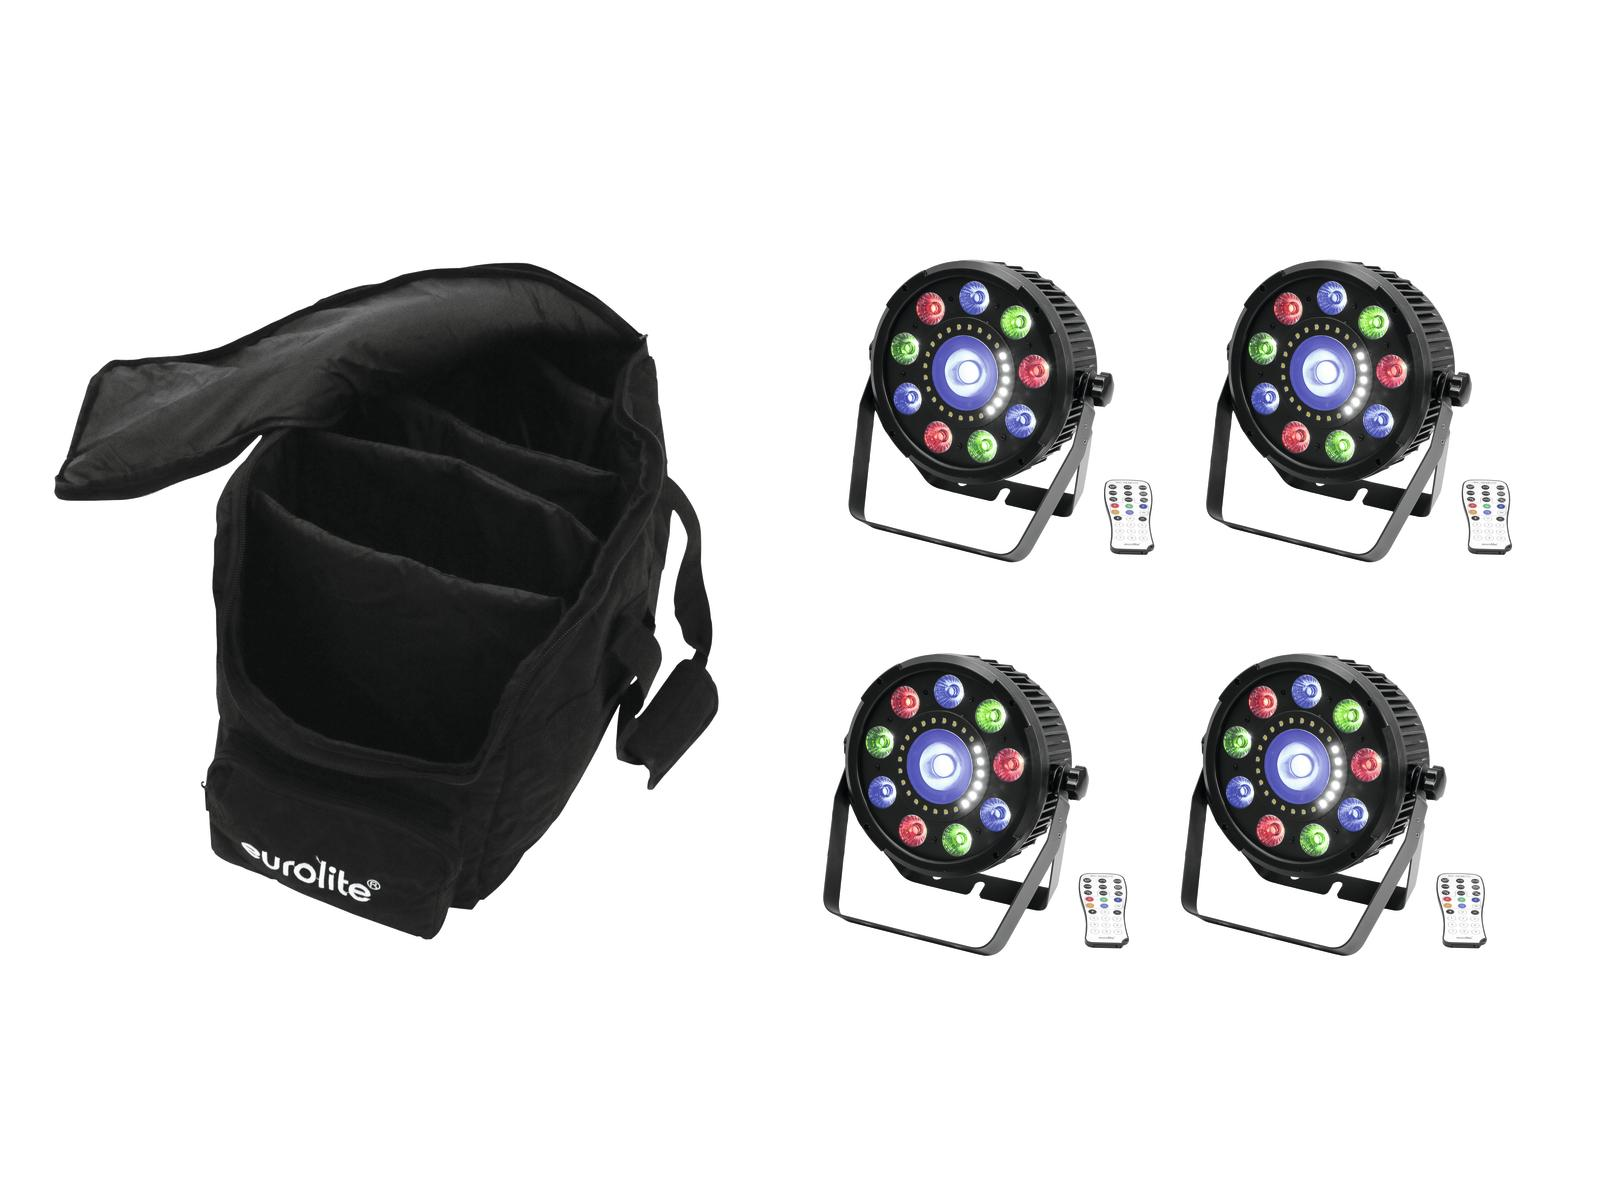 eurolite-set-4x-led-sls-9-hybrid-hcl-soft-bag